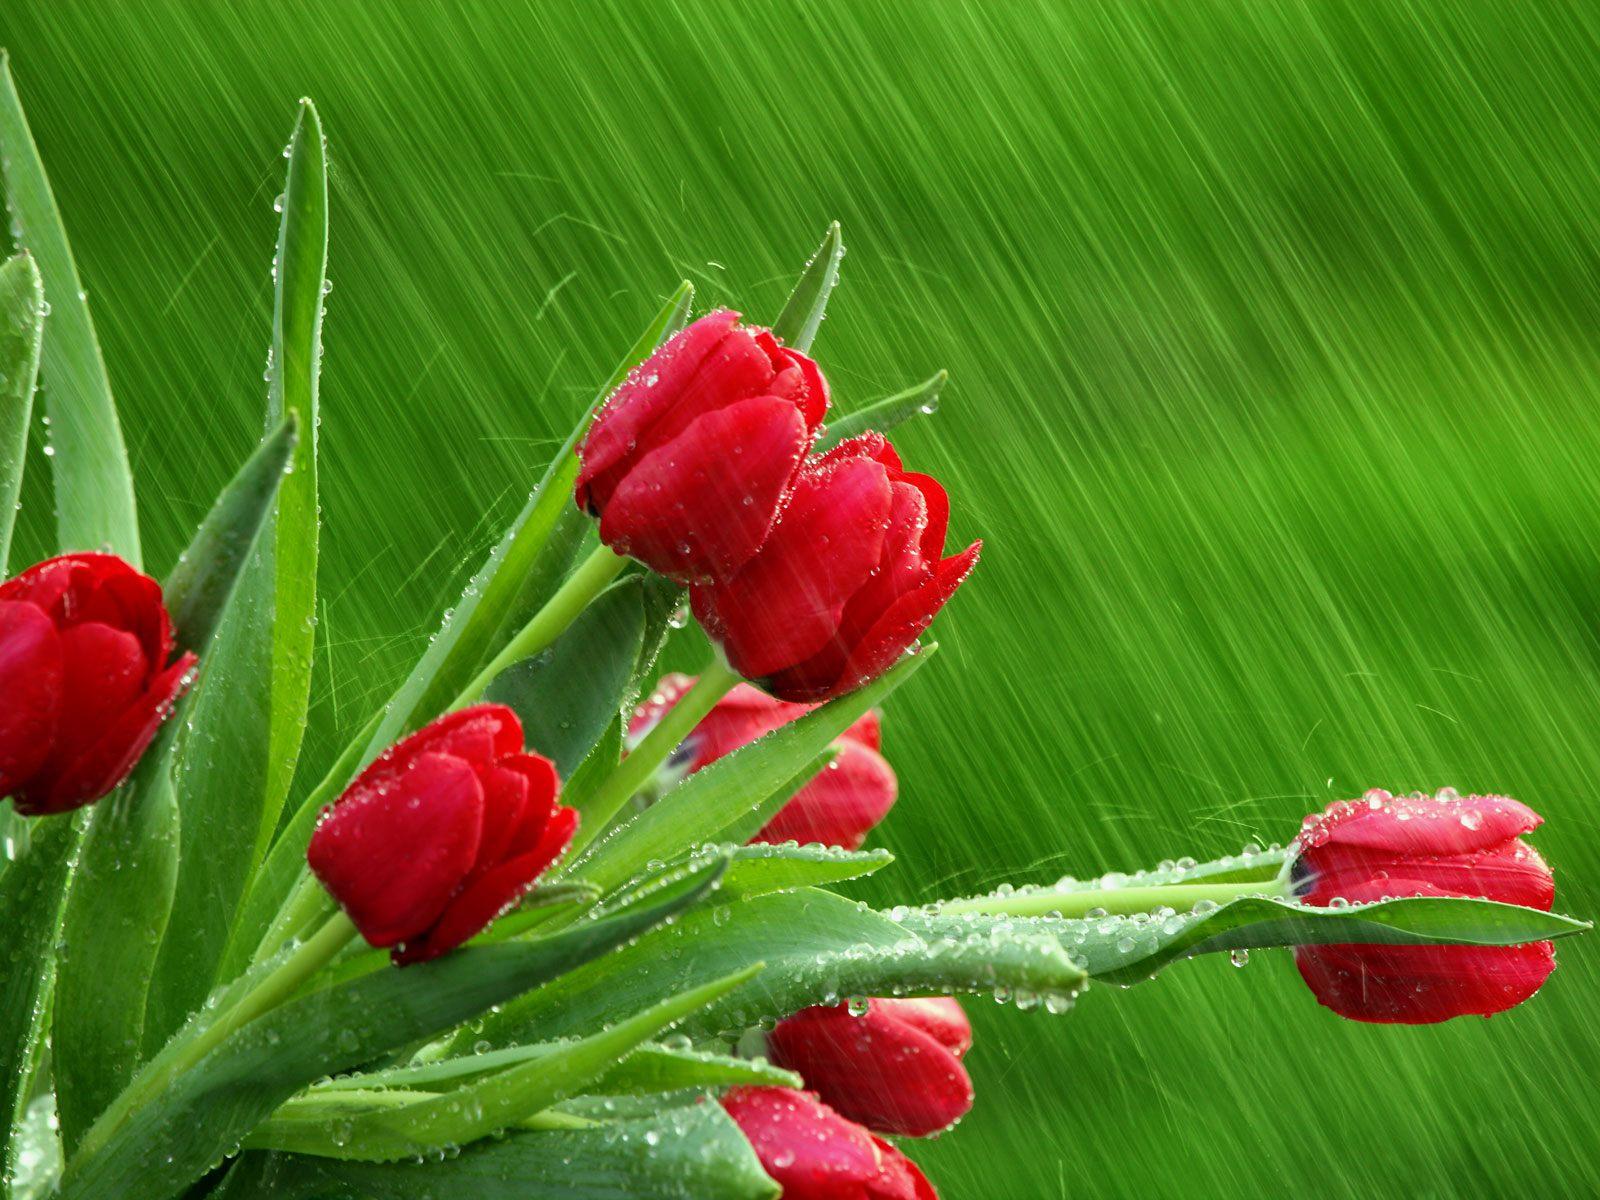 http://4.bp.blogspot.com/-2muUqZntYMc/TlGDJ6JmEiI/AAAAAAAAC8o/JuEB_cMaijQ/s1600/Beautiful+rain+wallpaper+3.jpg